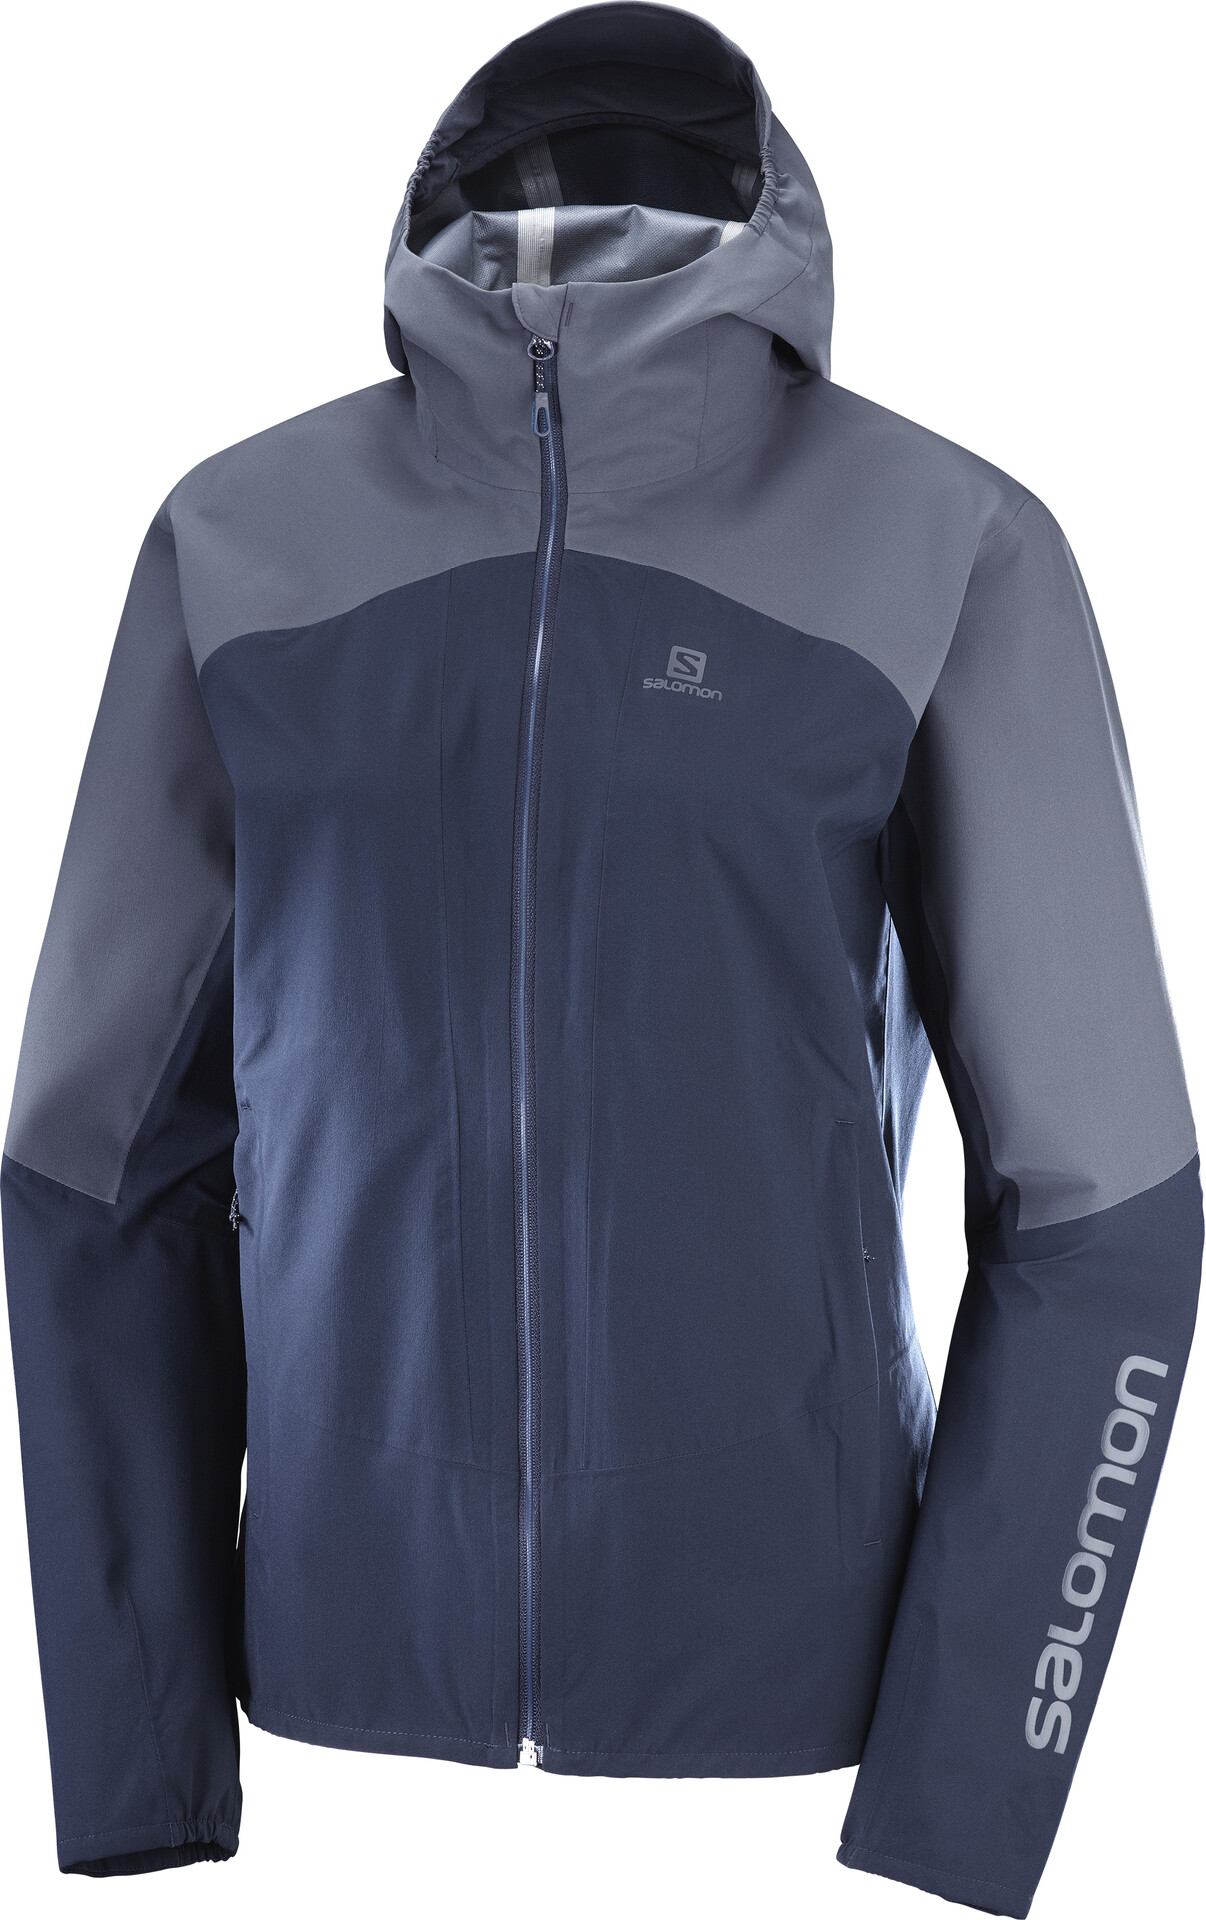 Salomon Outline Jacket Damen night skygraphite